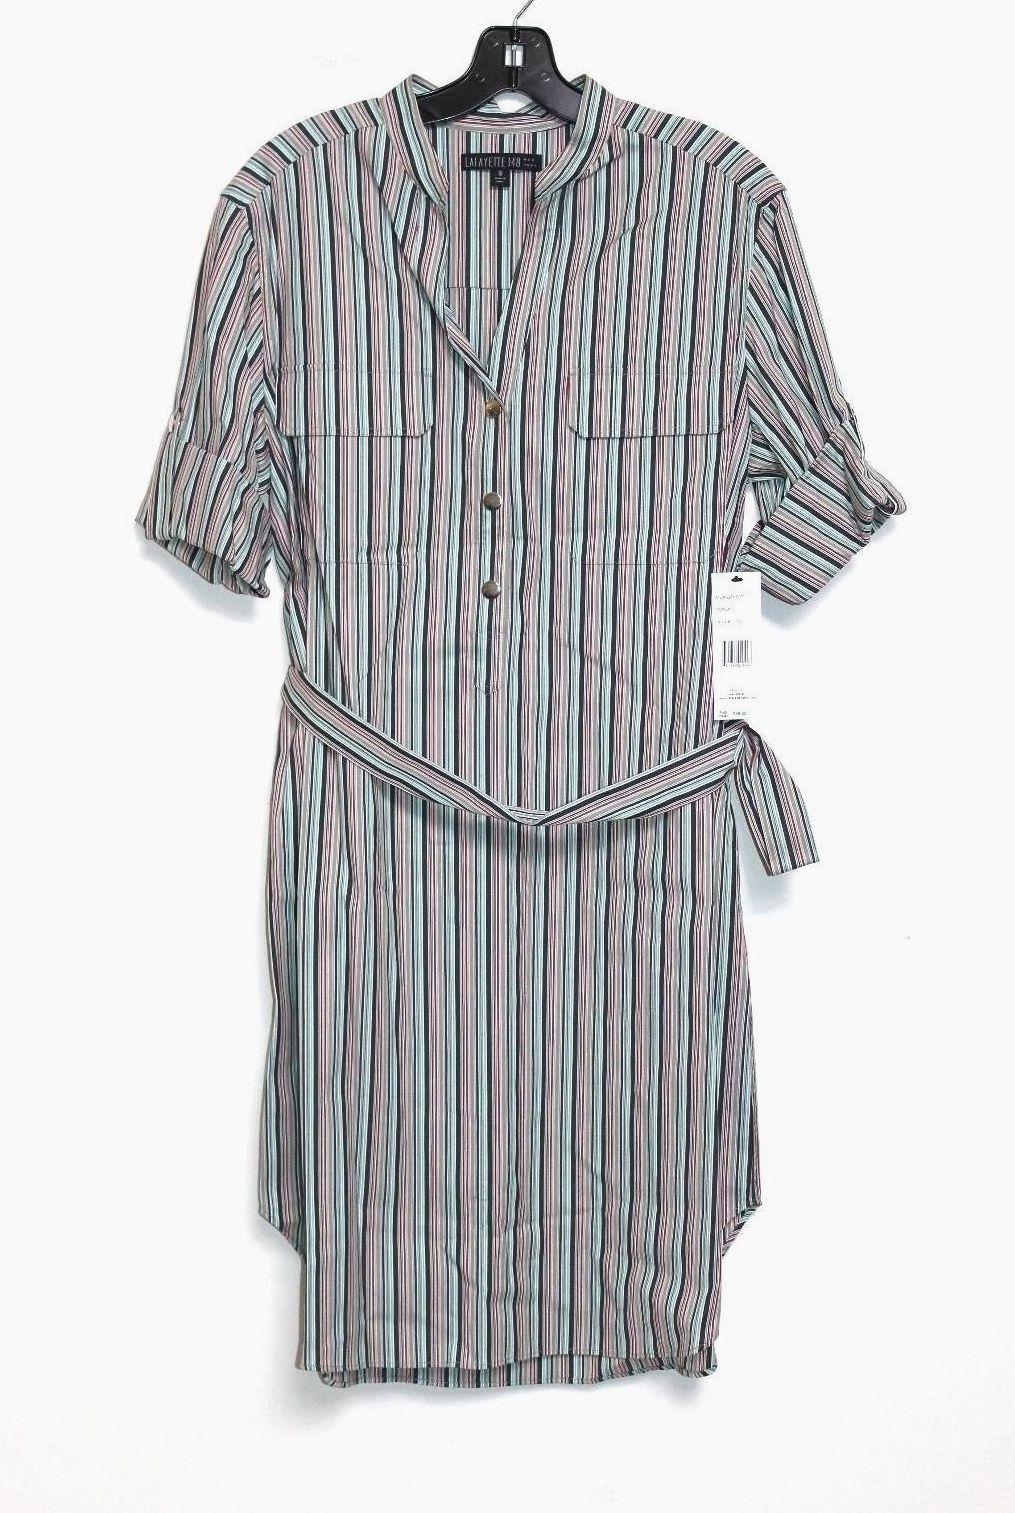 Lafayette 148 New York Women's 12 - NWOT 398 - Striped Cotton Belted Shirt Dress